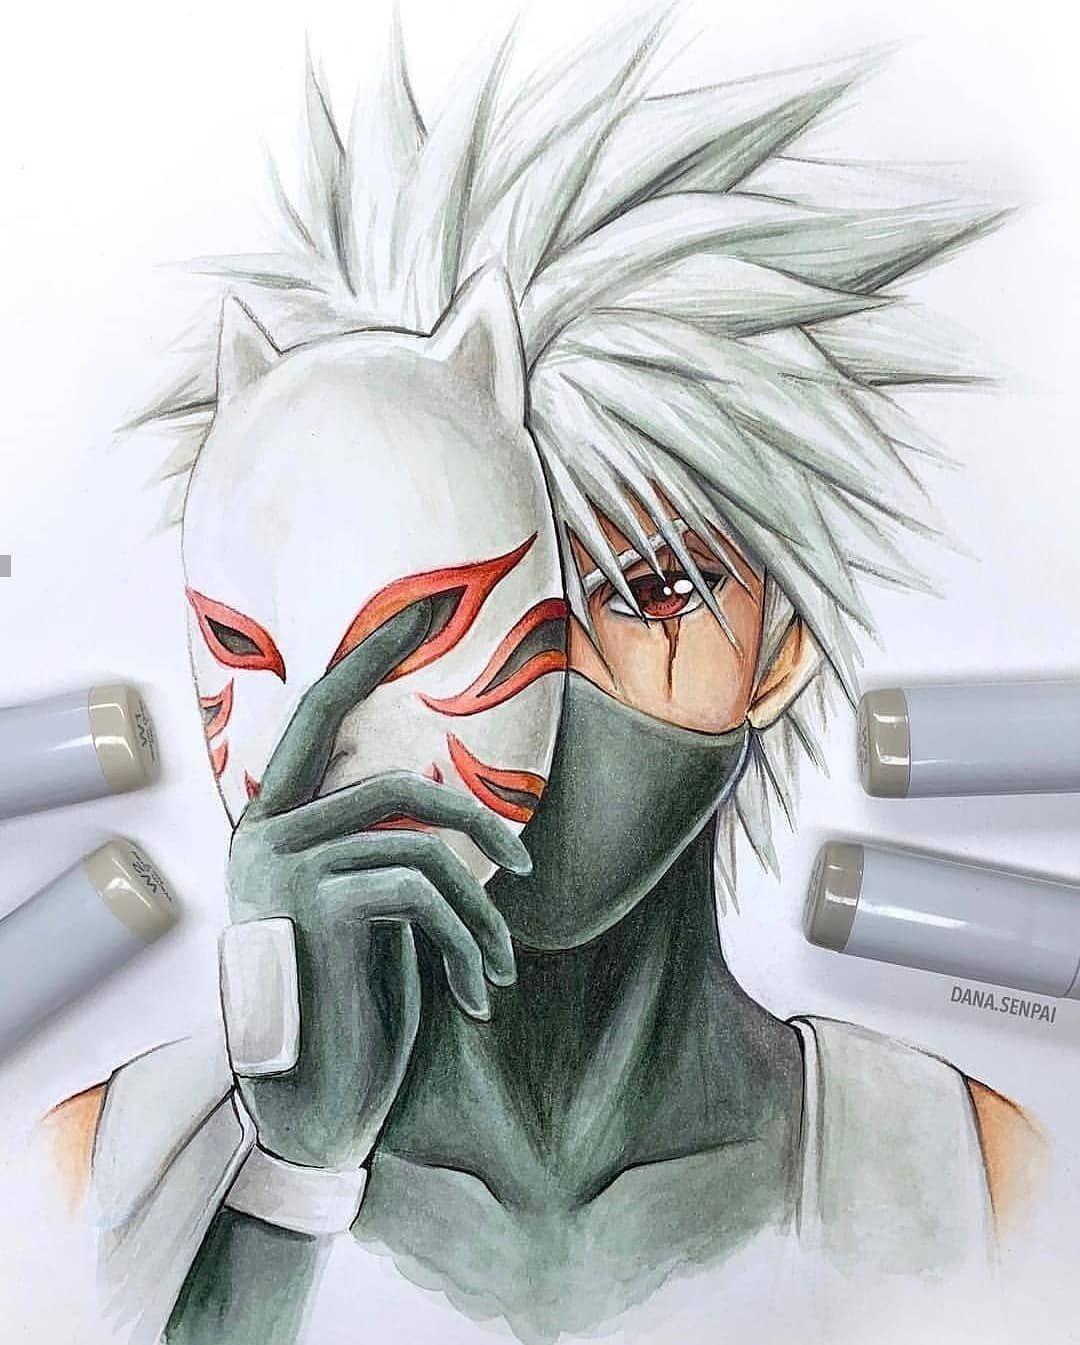 Pin By Samuel Carrero On Risunki In 2020 Kakashi Drawing Kakashi Hatake Naruto Drawings